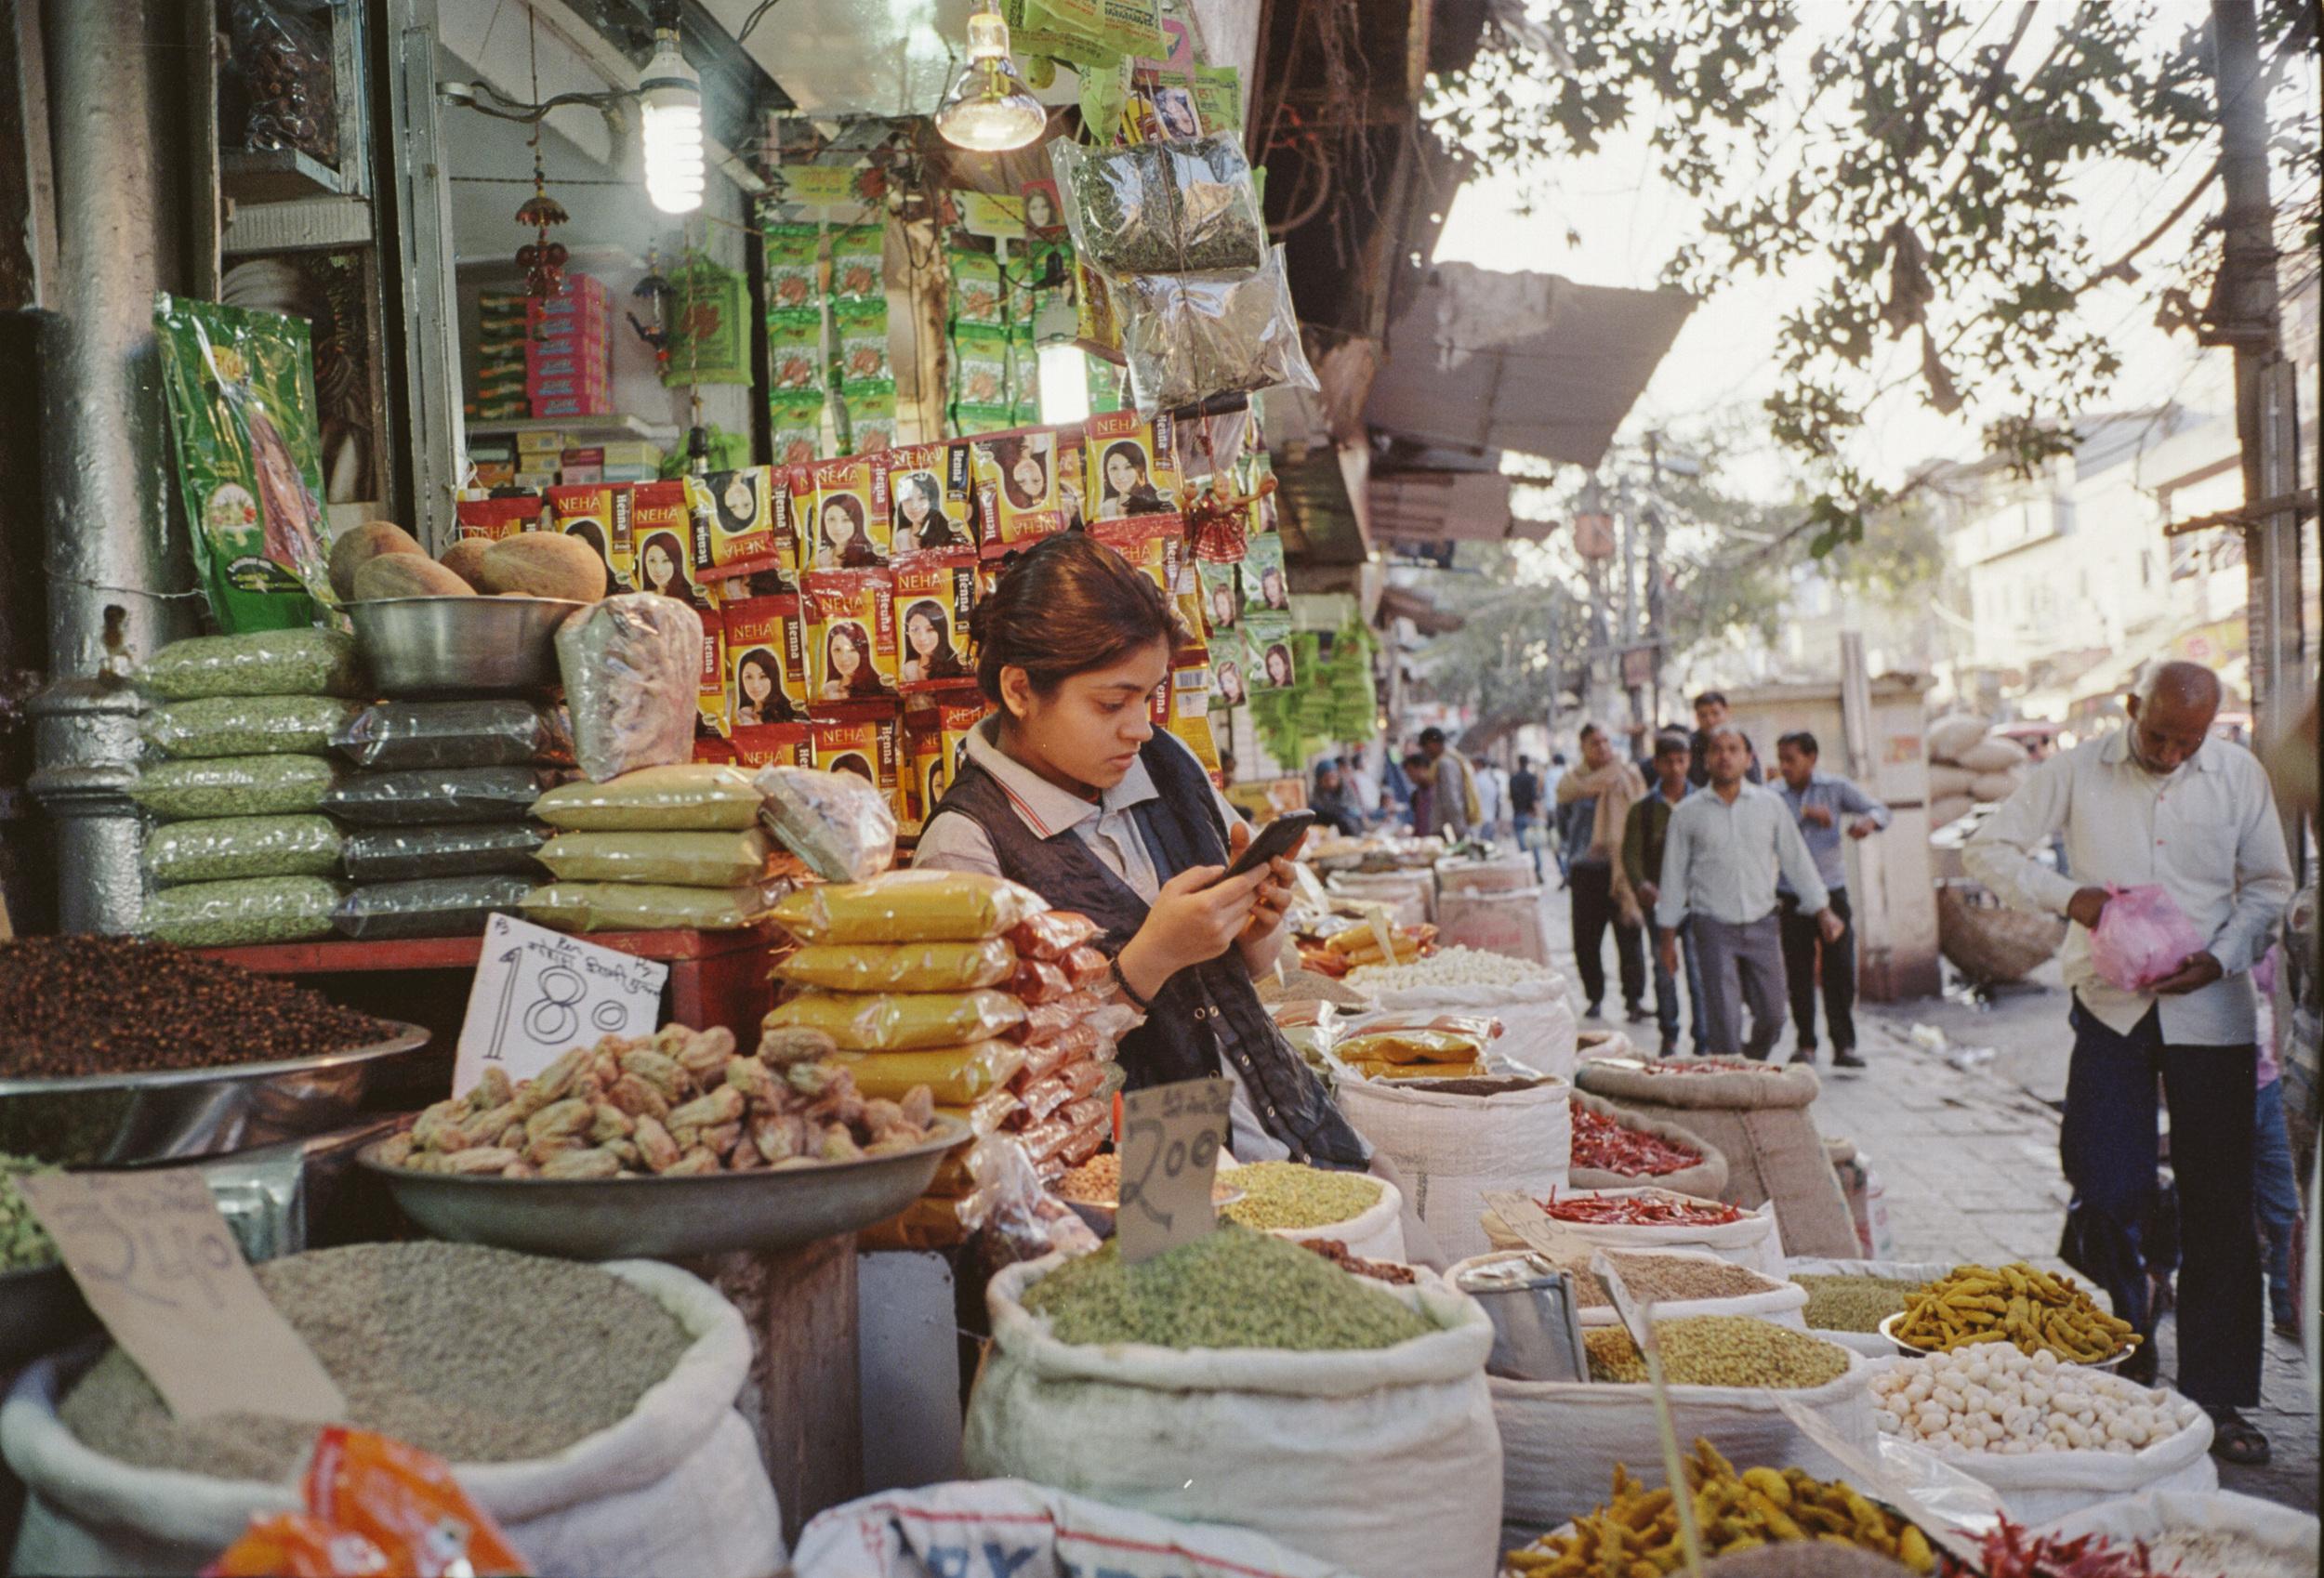 72-F11_Spice Market, Delhi, India 2016-16.jpg